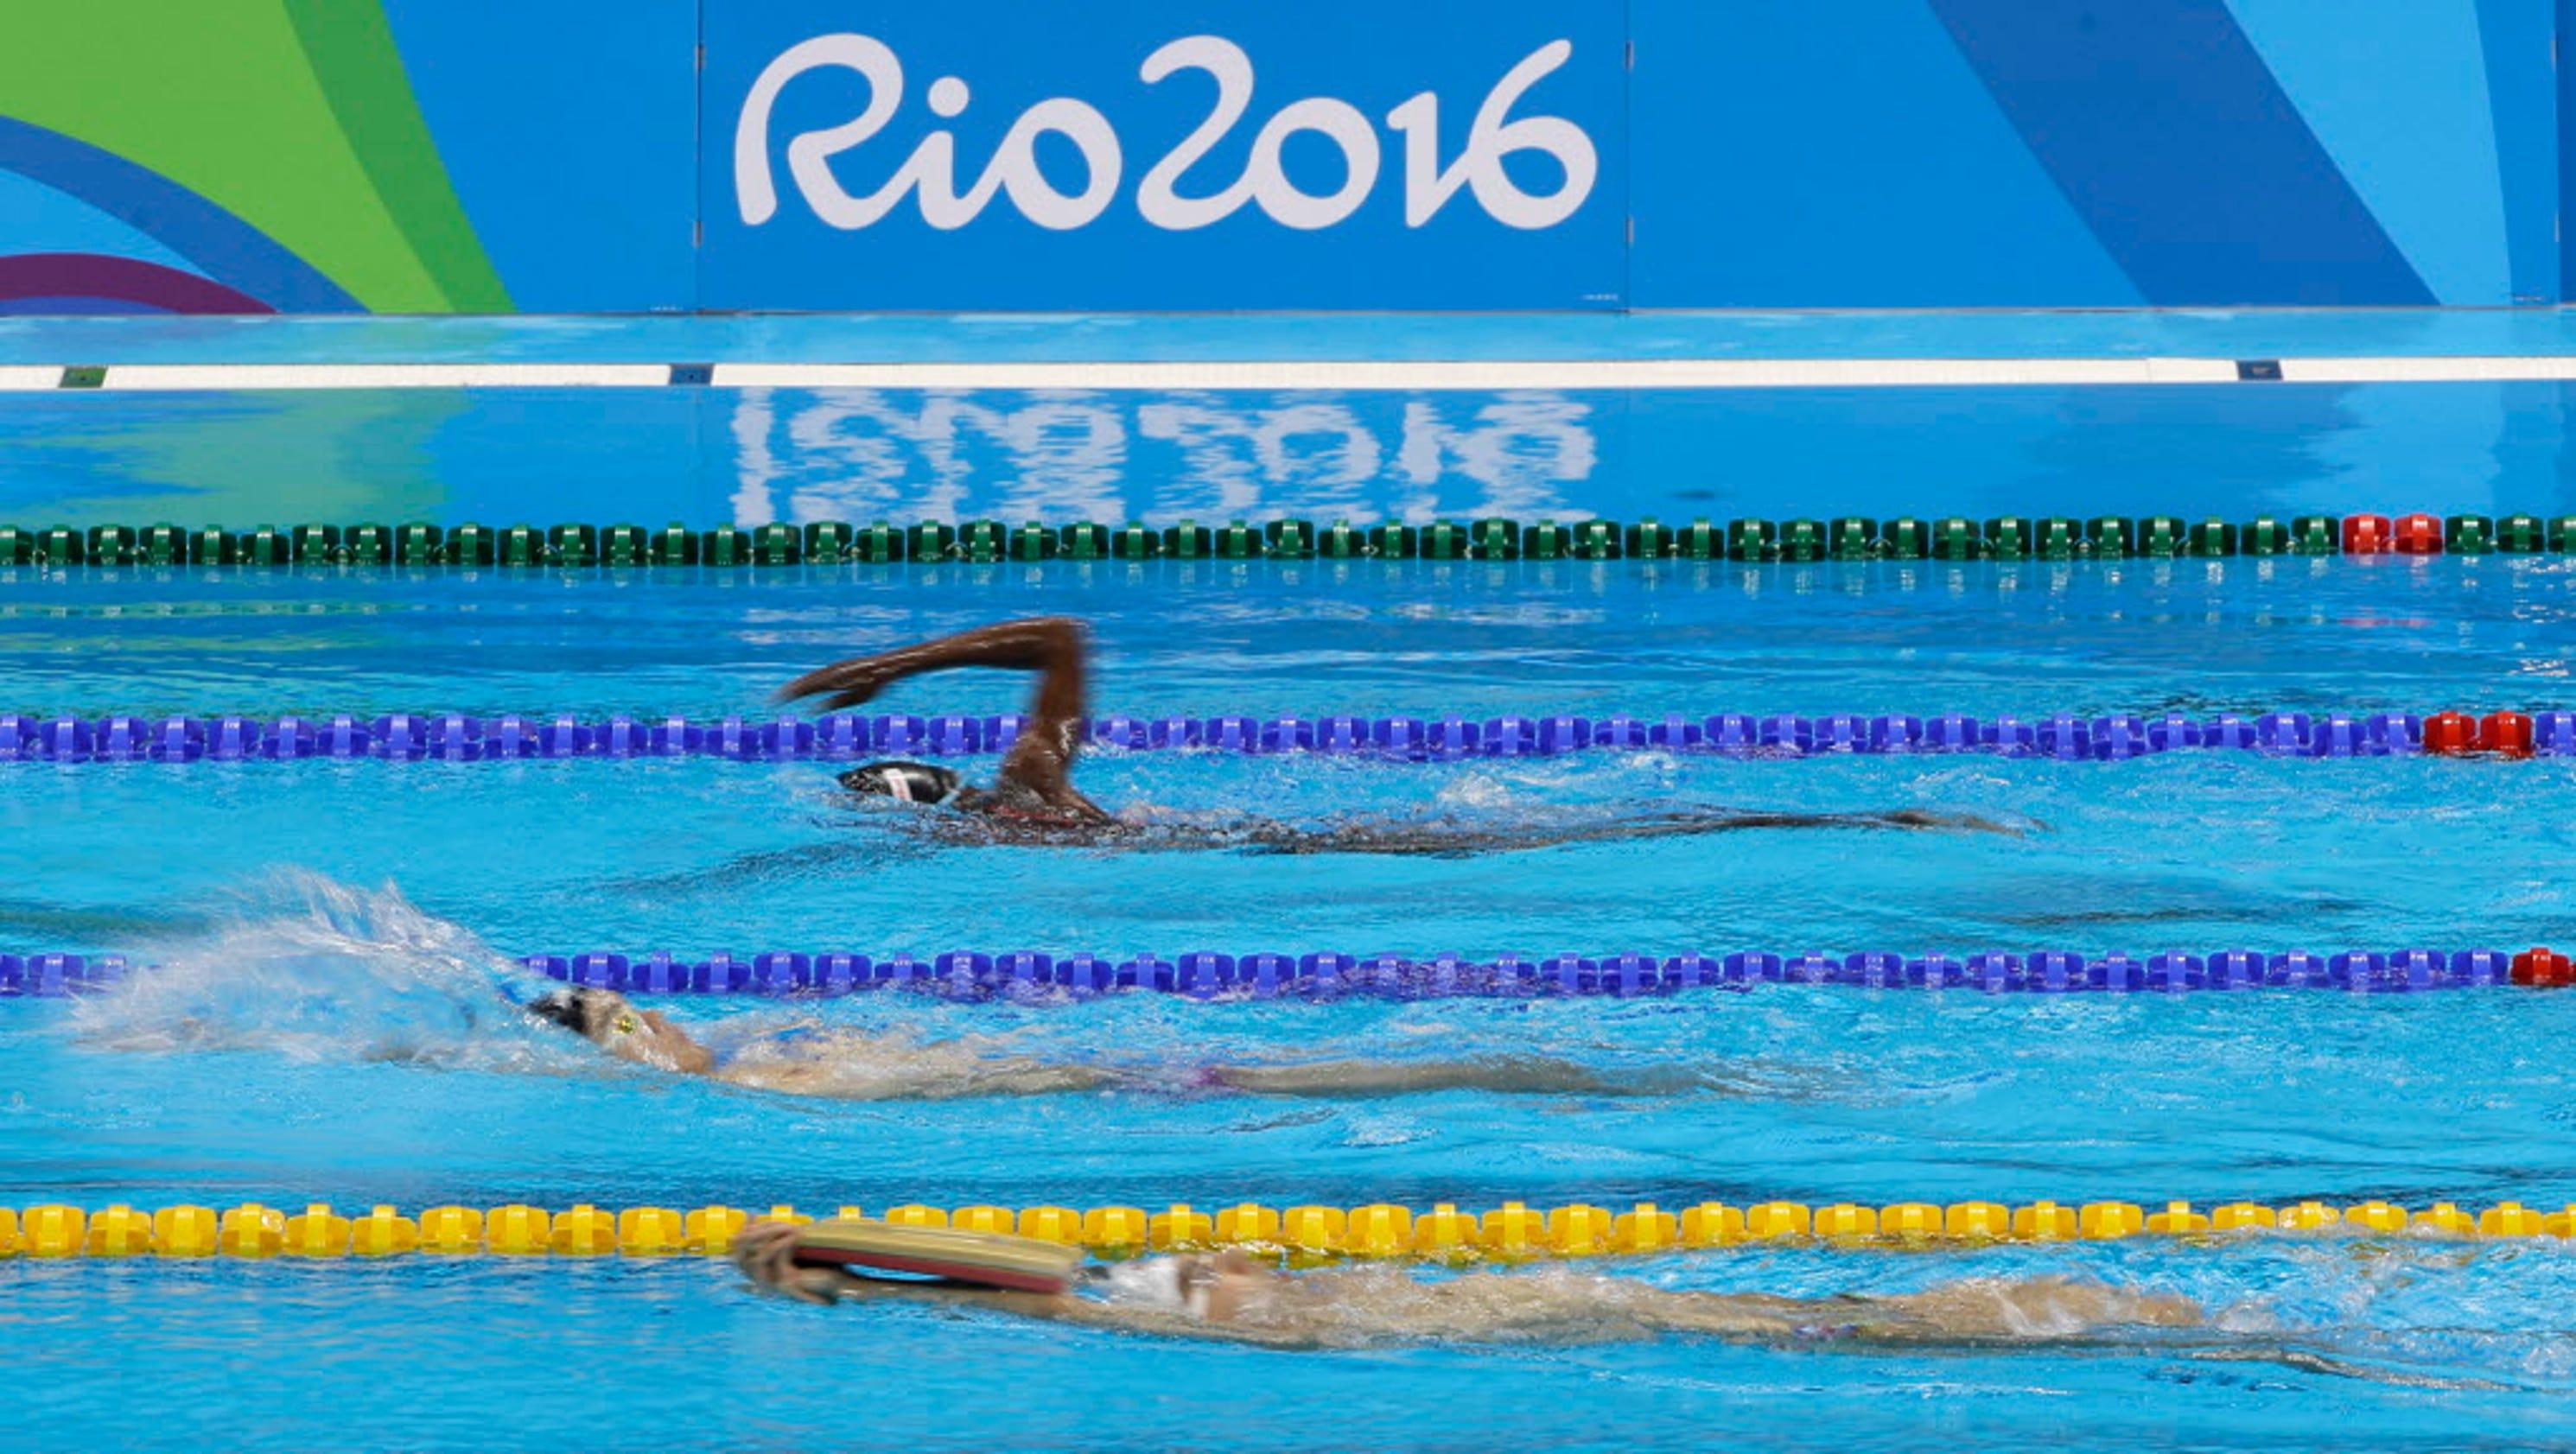 Australian Swim Coach Pulls Athletes From Rio Training Pool